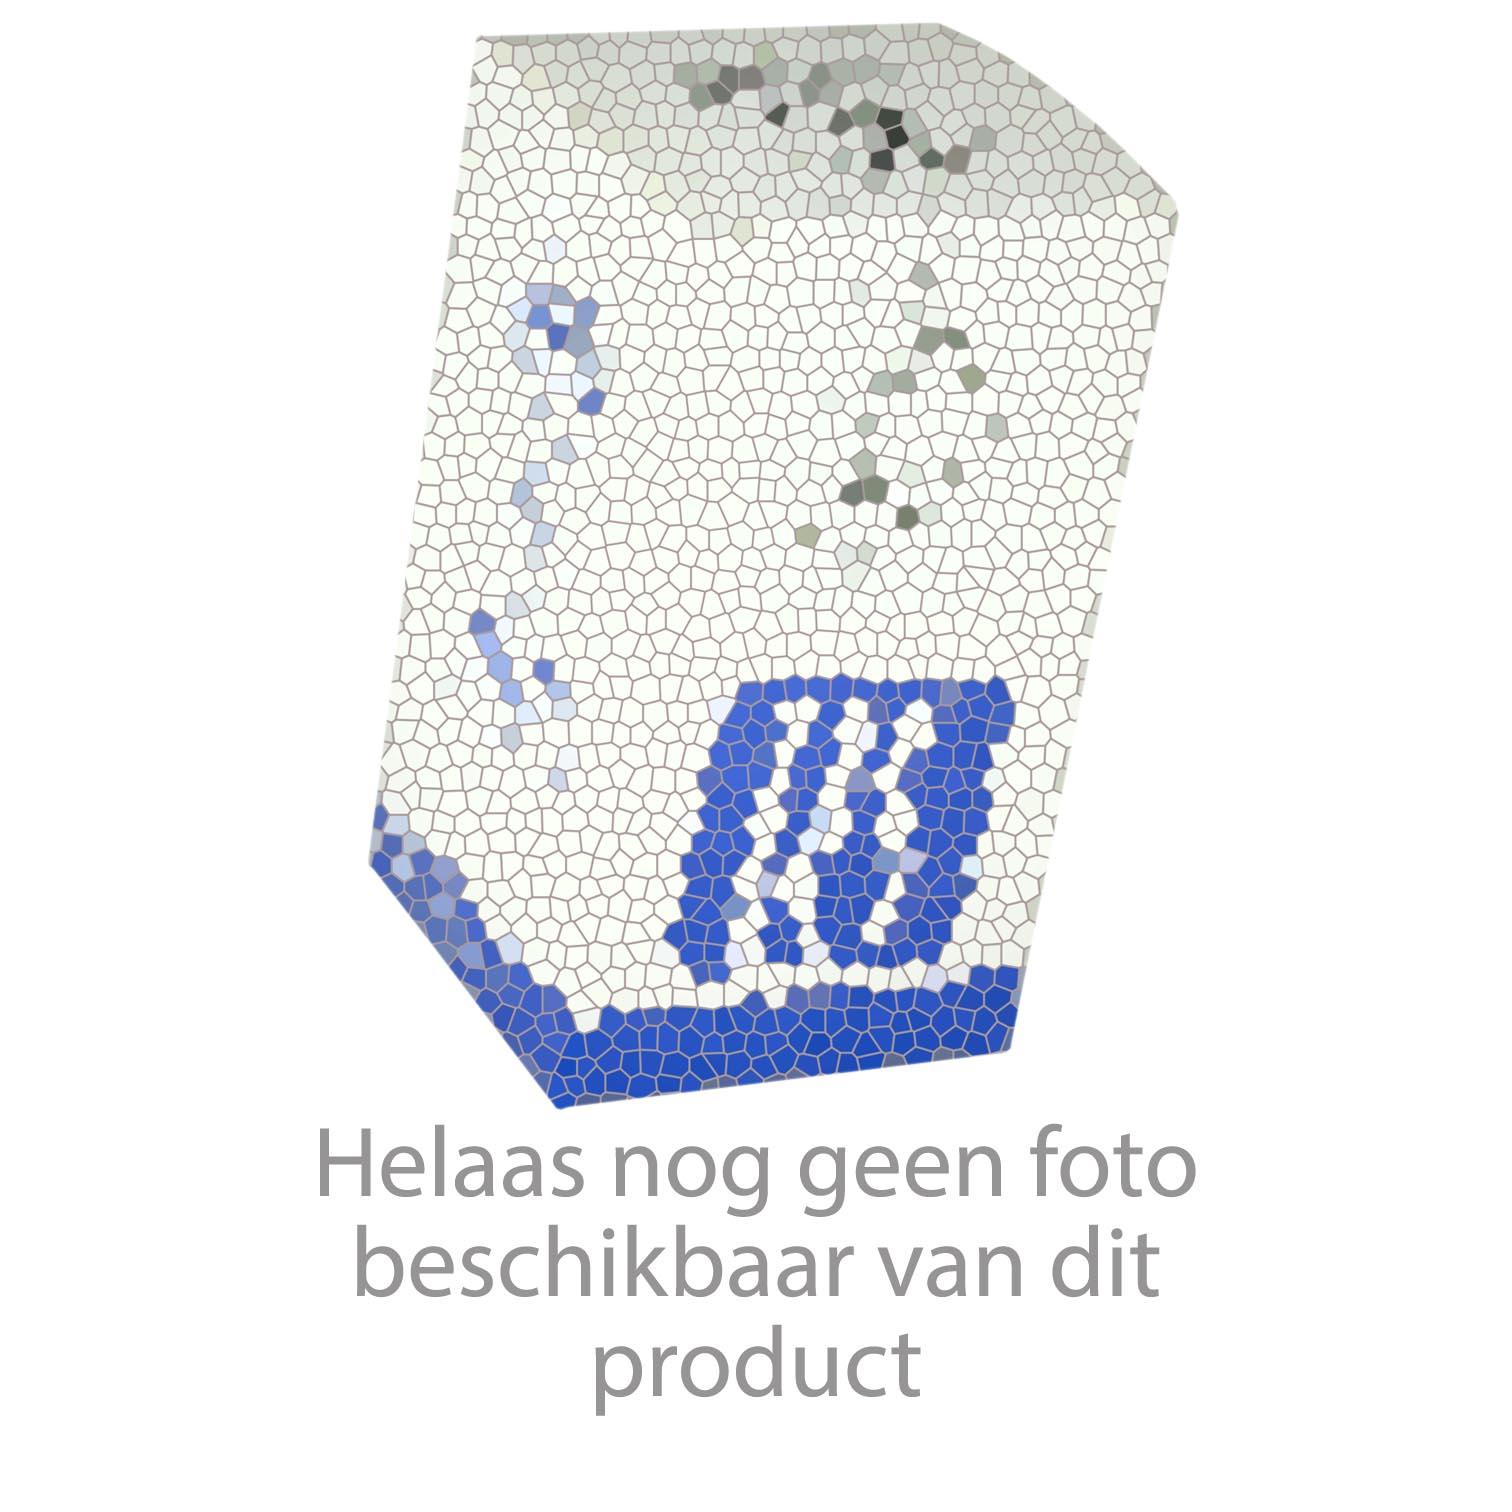 Kwc Onderdelen Vita Pro Keukenkraan 1-Greeps Met Uittrekbare Kop Artikelnummer 10.291.033.000Fl